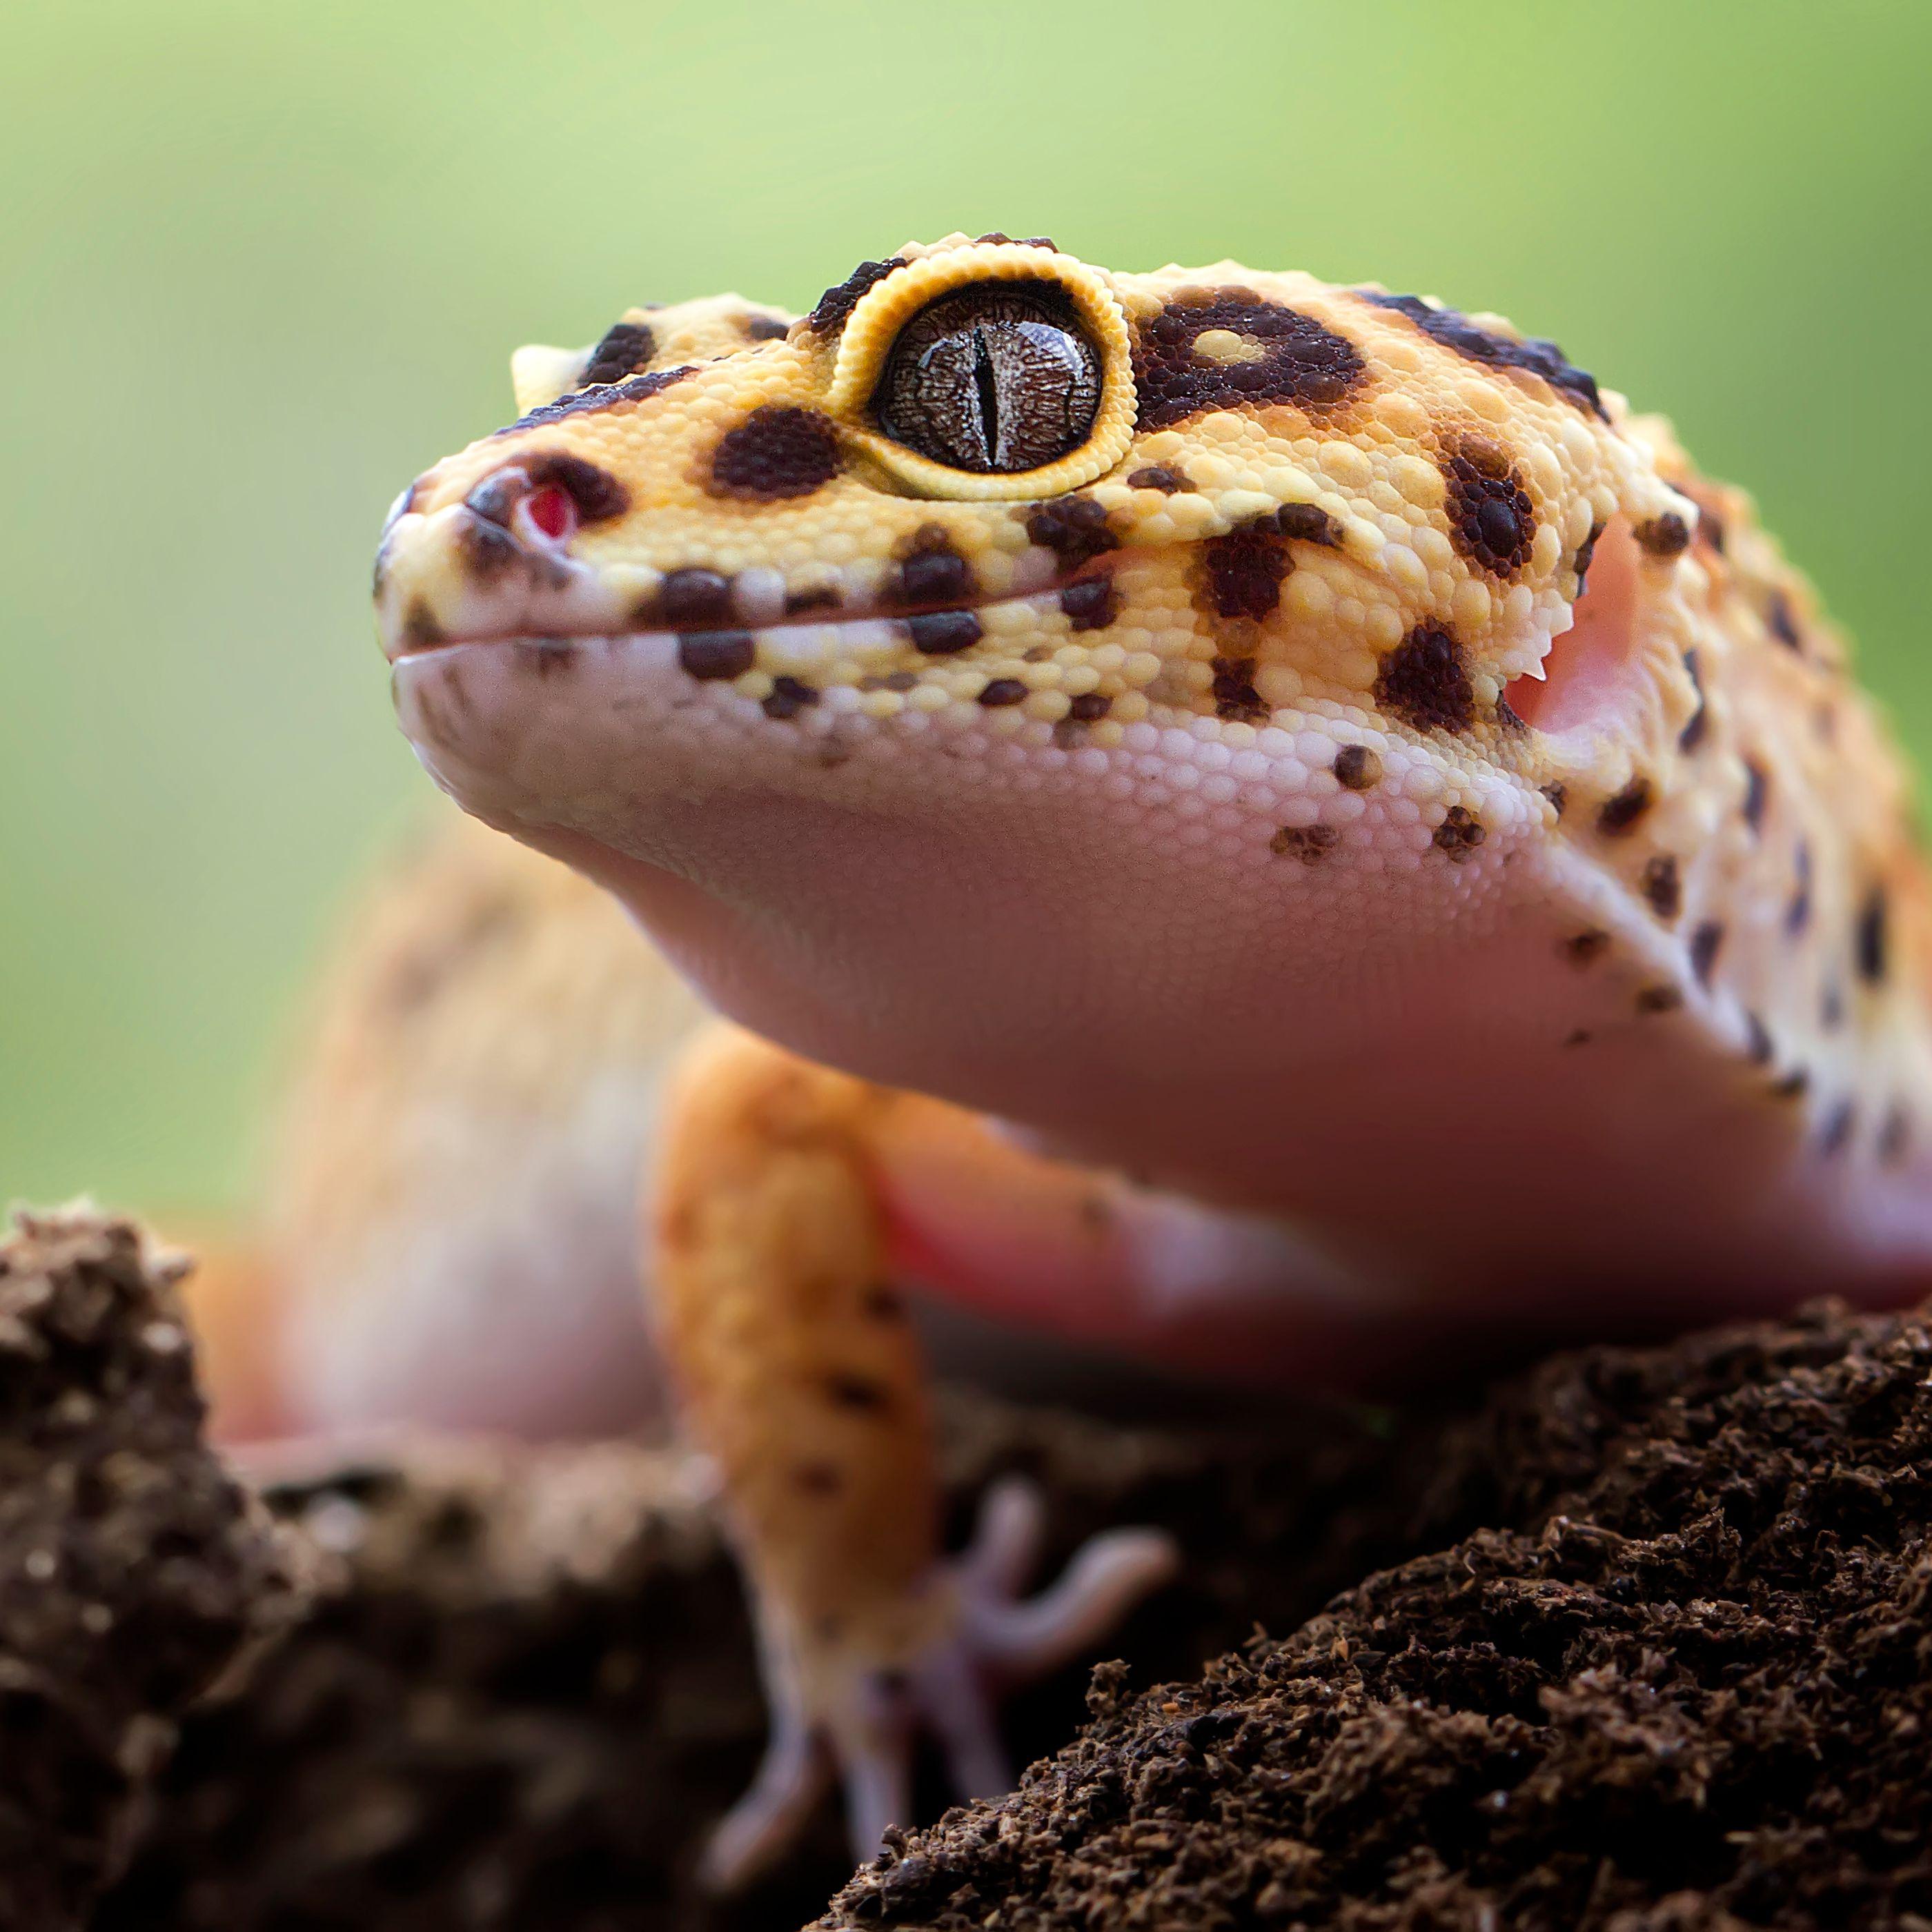 close up of lizard on field 5aa81c fa ba854